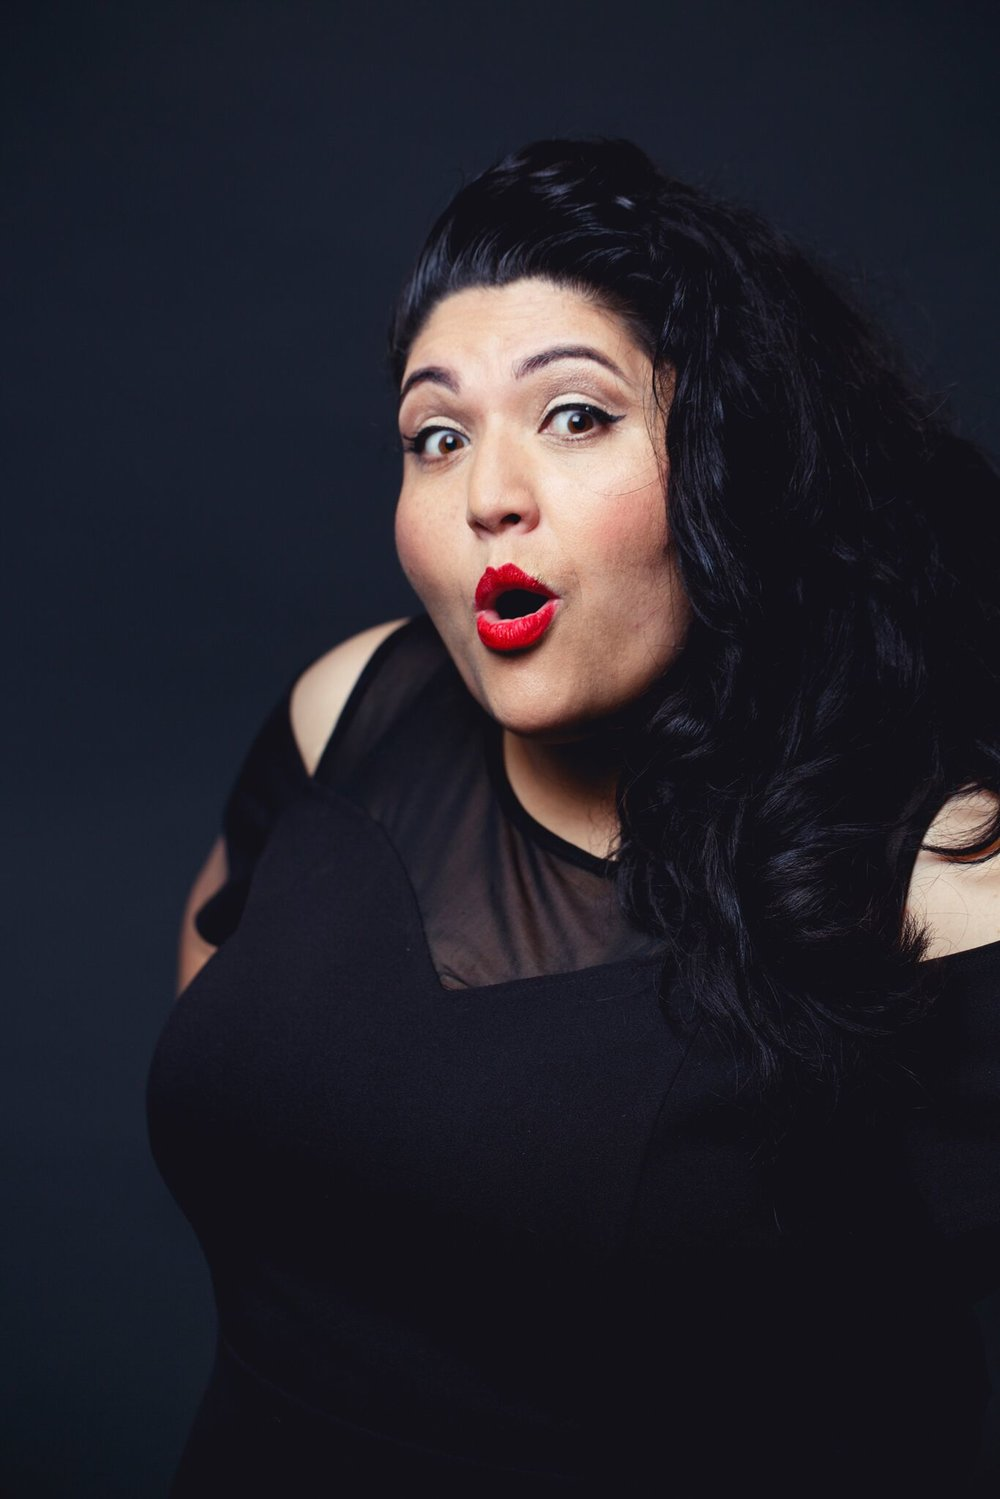 Claudia Fuentes-Beltran Coming Soon